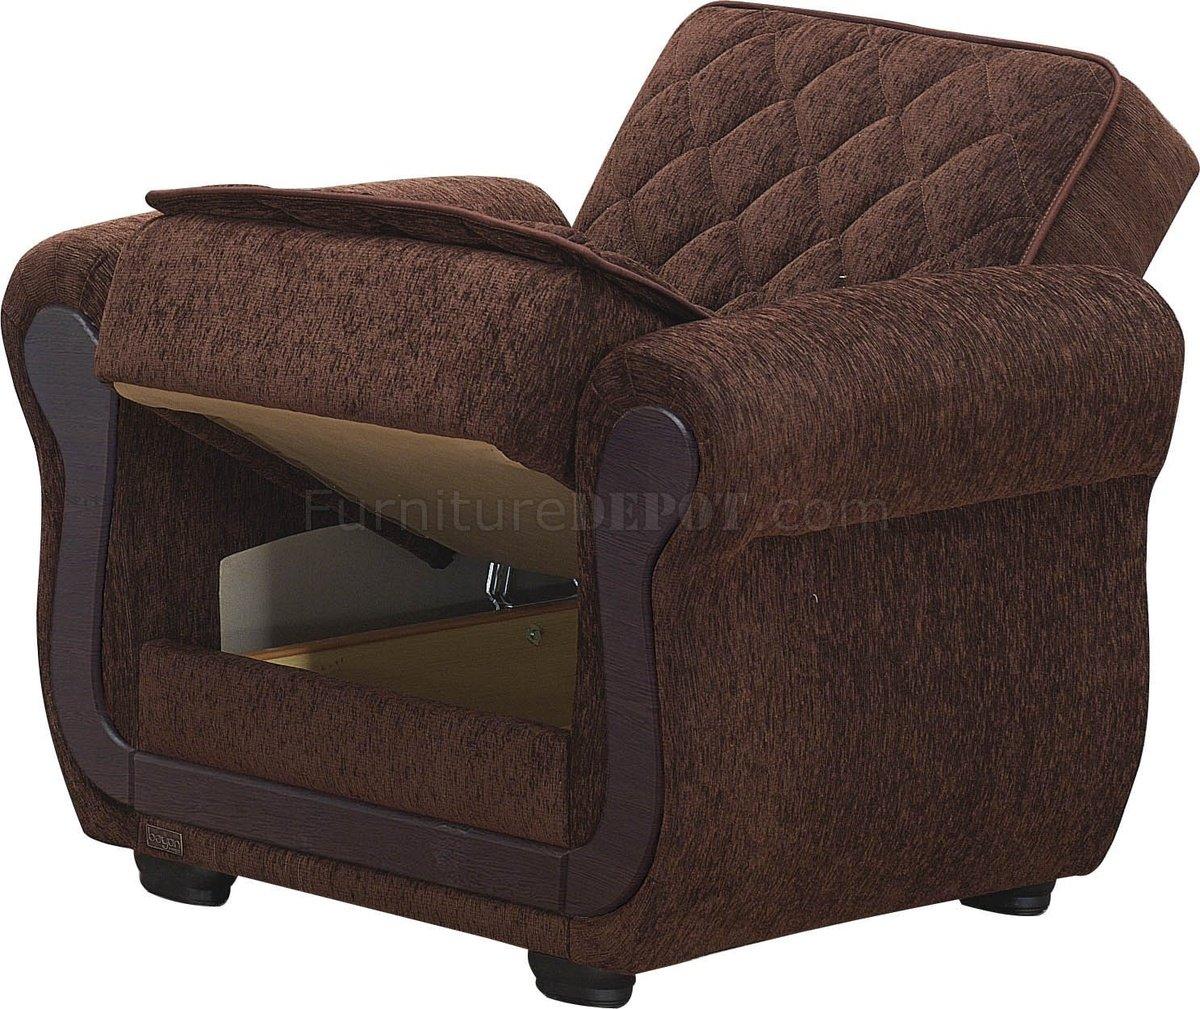 Sunrise Sofa Bed Convertible Dark Brown Fabric W Optional